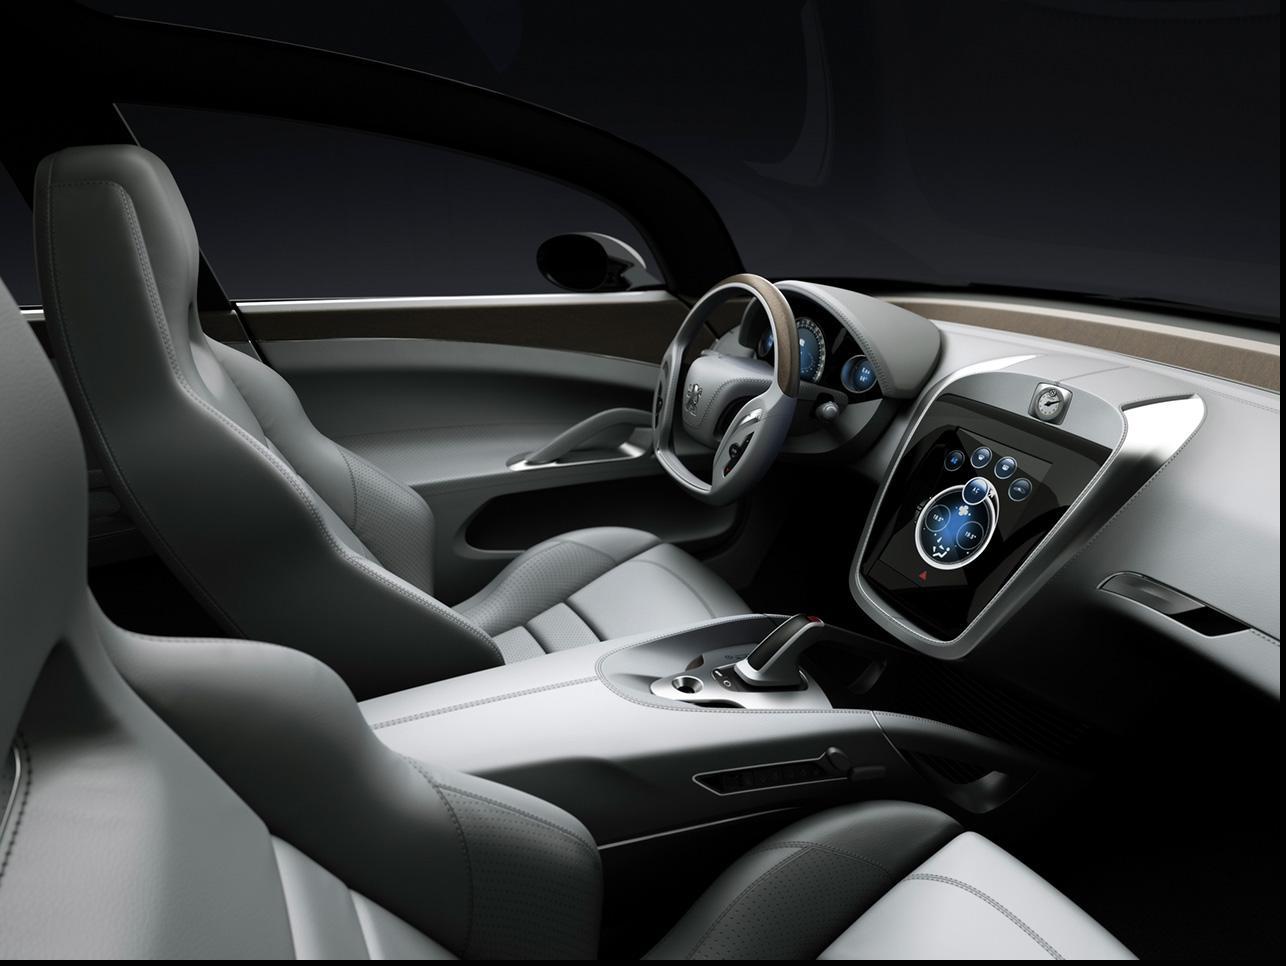 2006-peugeot-908-rc-concept-interior-modeli-super-ic-dizayn-passenger-view-1280x960.jpg